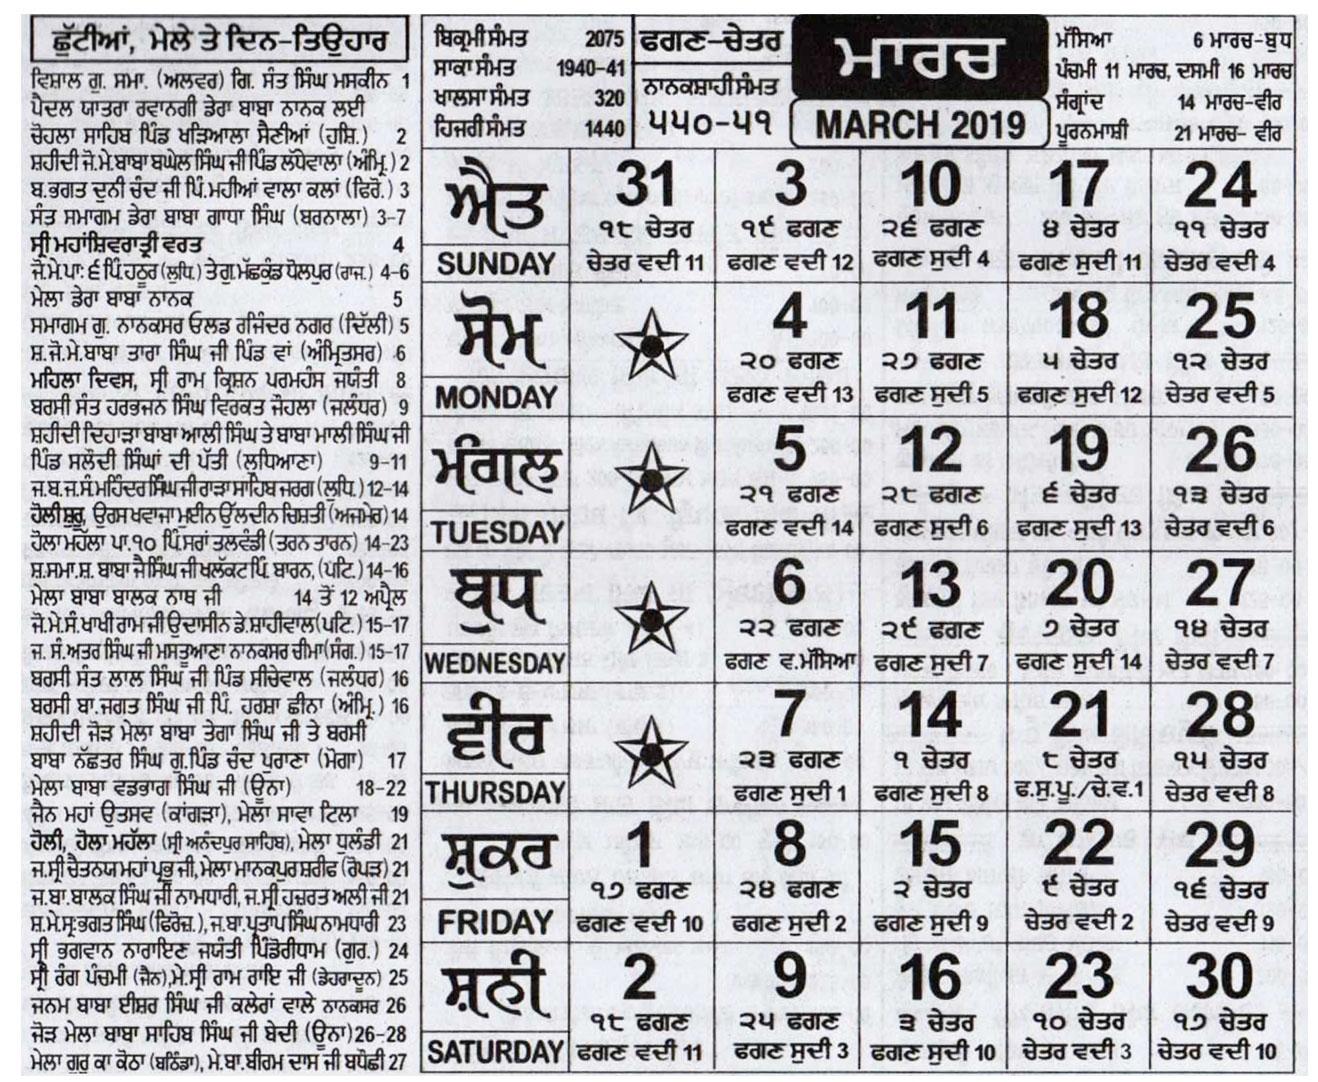 2021 Khalsa Hira Jantri • Printable Blank Calendar Template intended for Heera Jantri In 2021